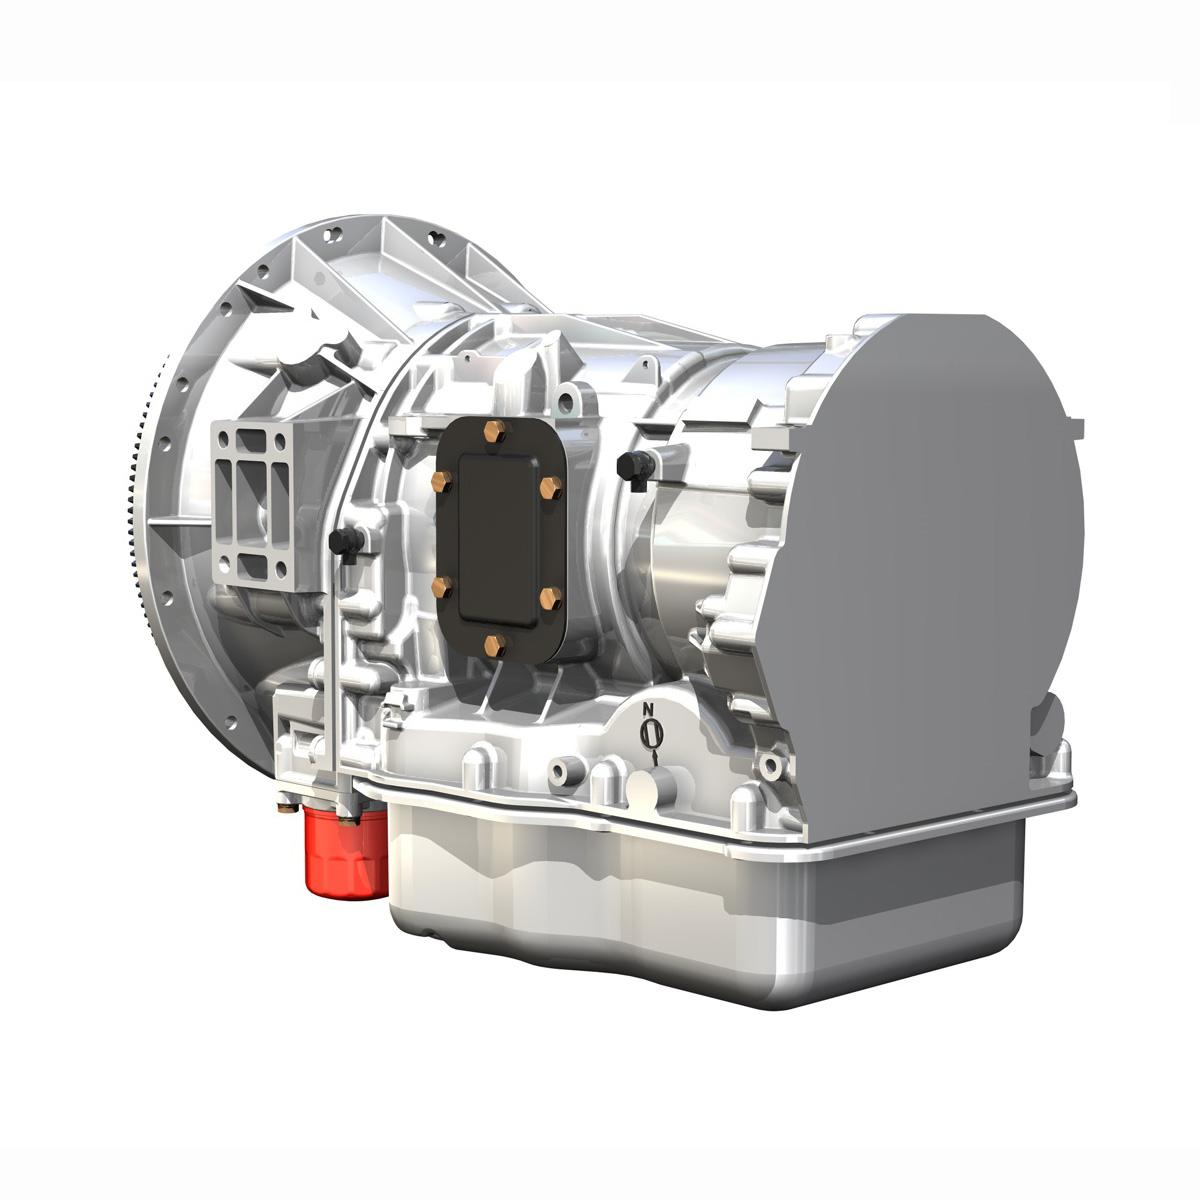 gearing – transmission 3d model 3ds fbx c4d lwo obj 189232